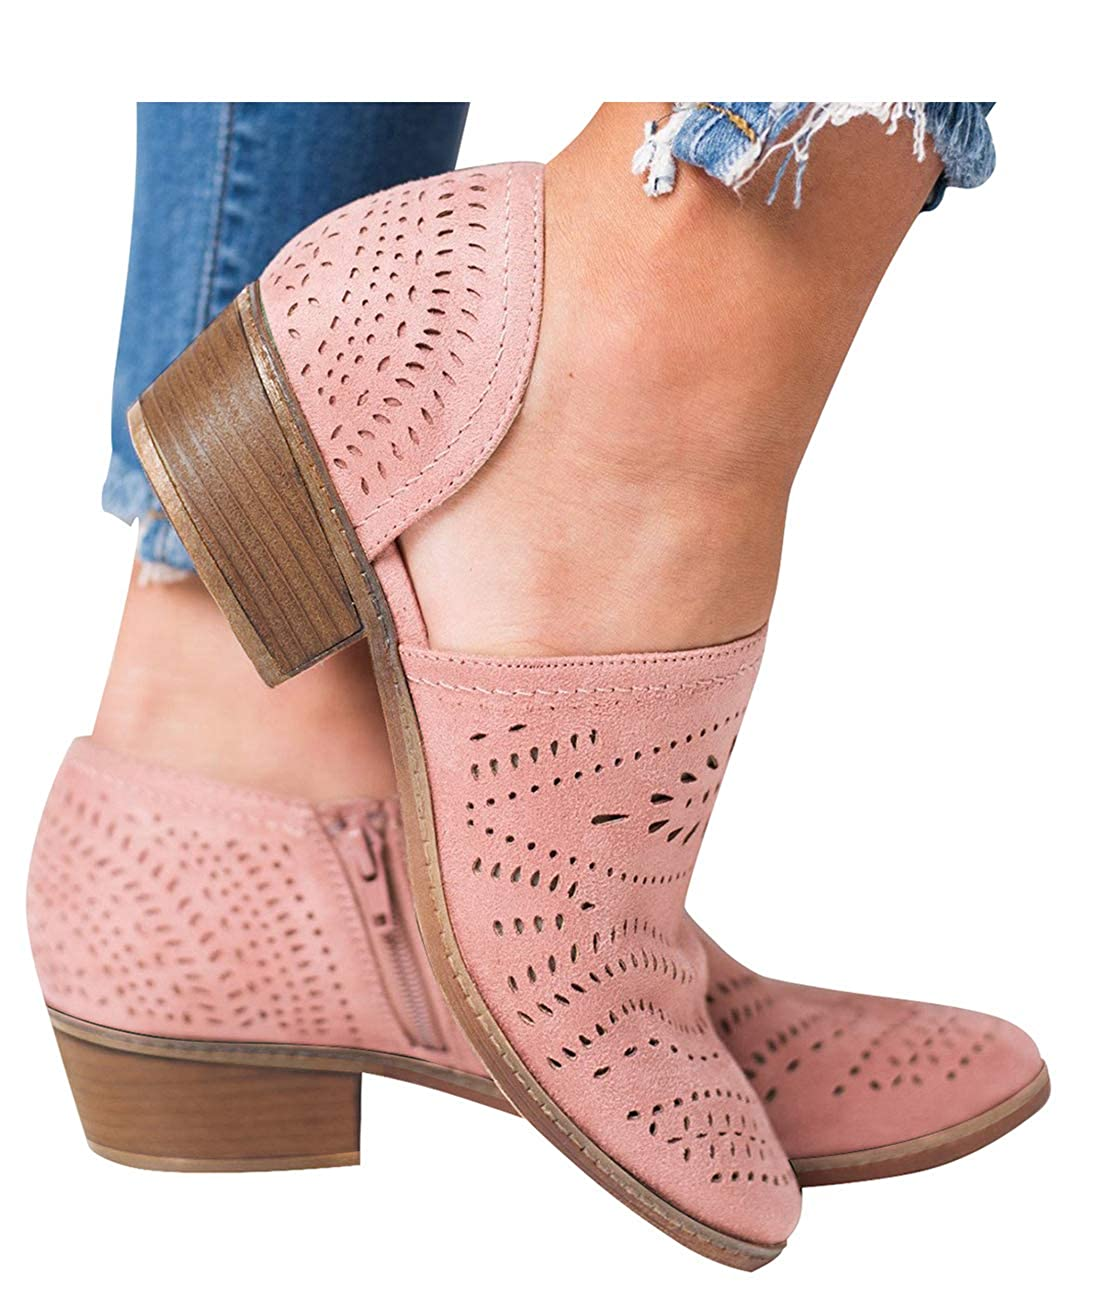 New-pink Blivener Men's Casual Handmade Driving shoes Slip on Loafer